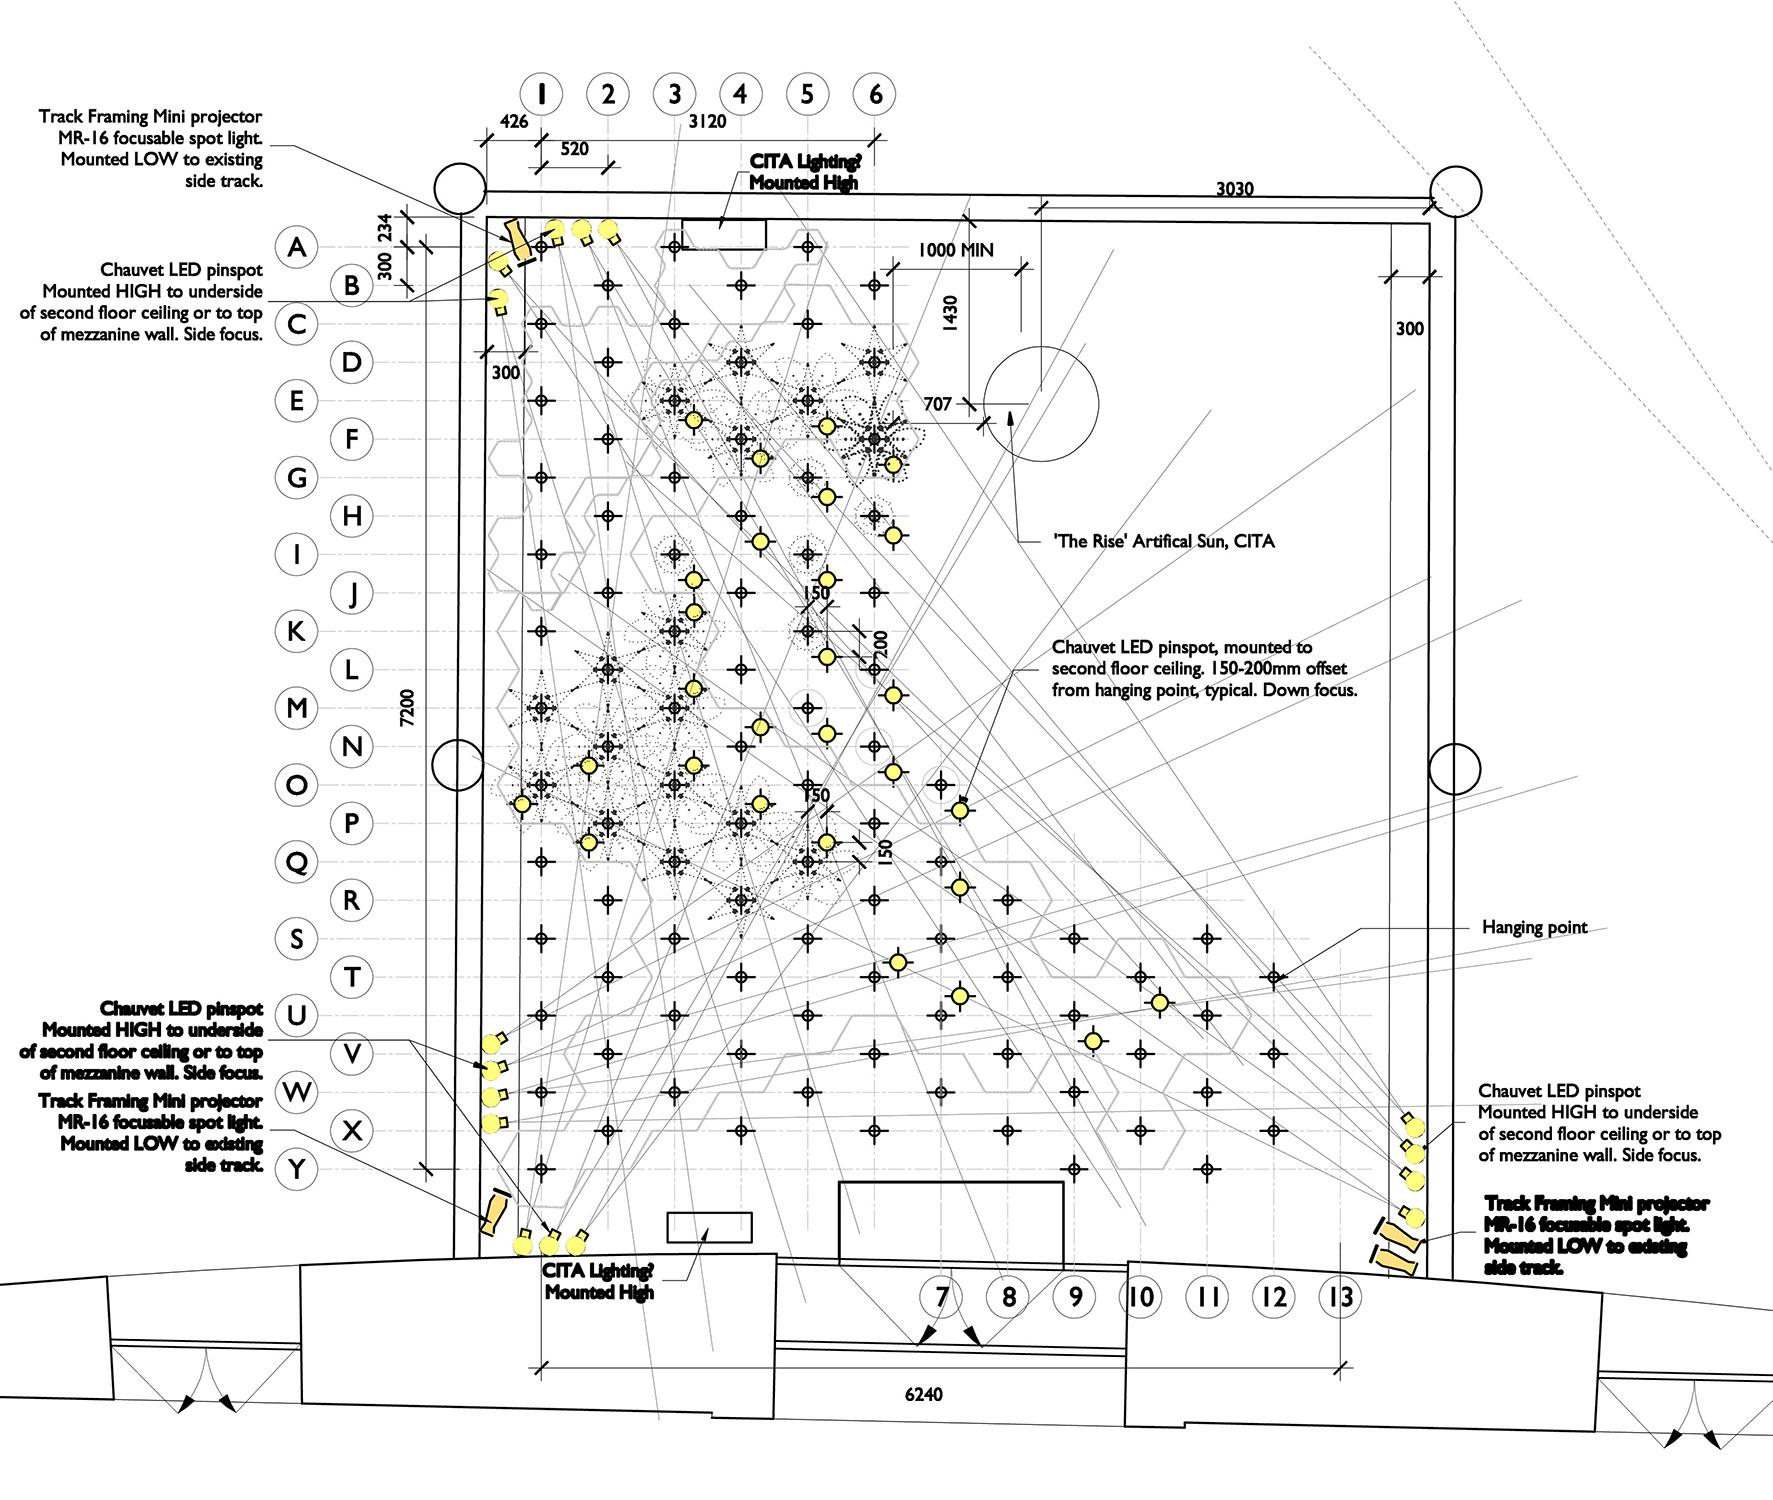 13D03 - 1218 -A4a - Lighting Pinspot spread sq.jpg